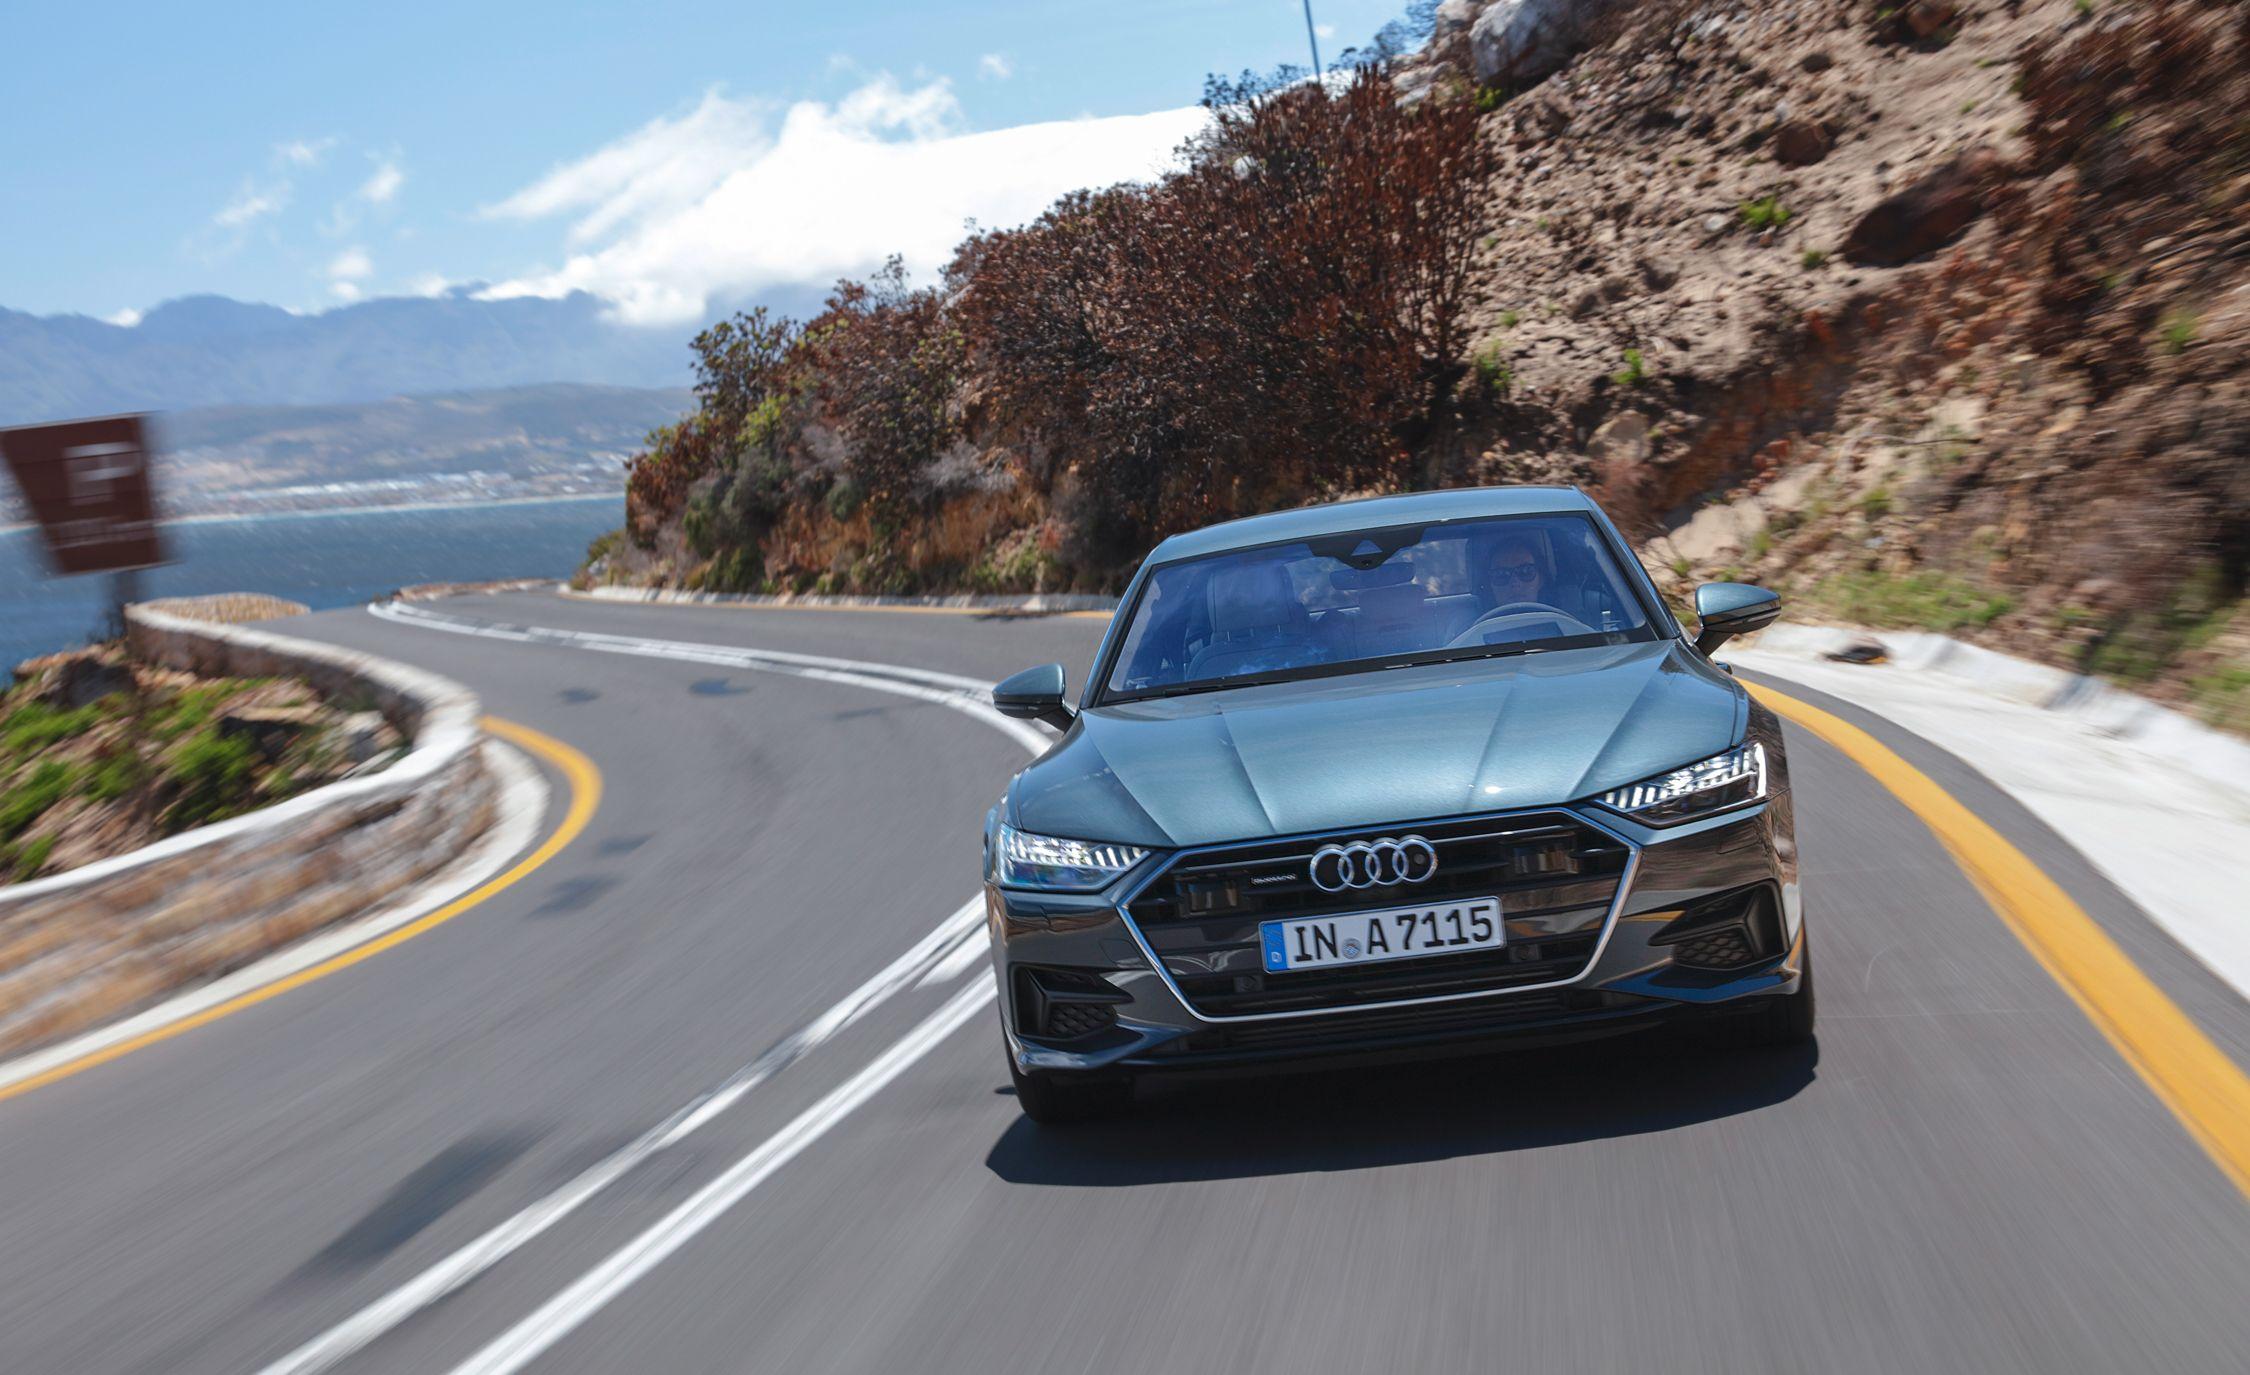 2019-Audi-A7-Sportback-163-1.jpg